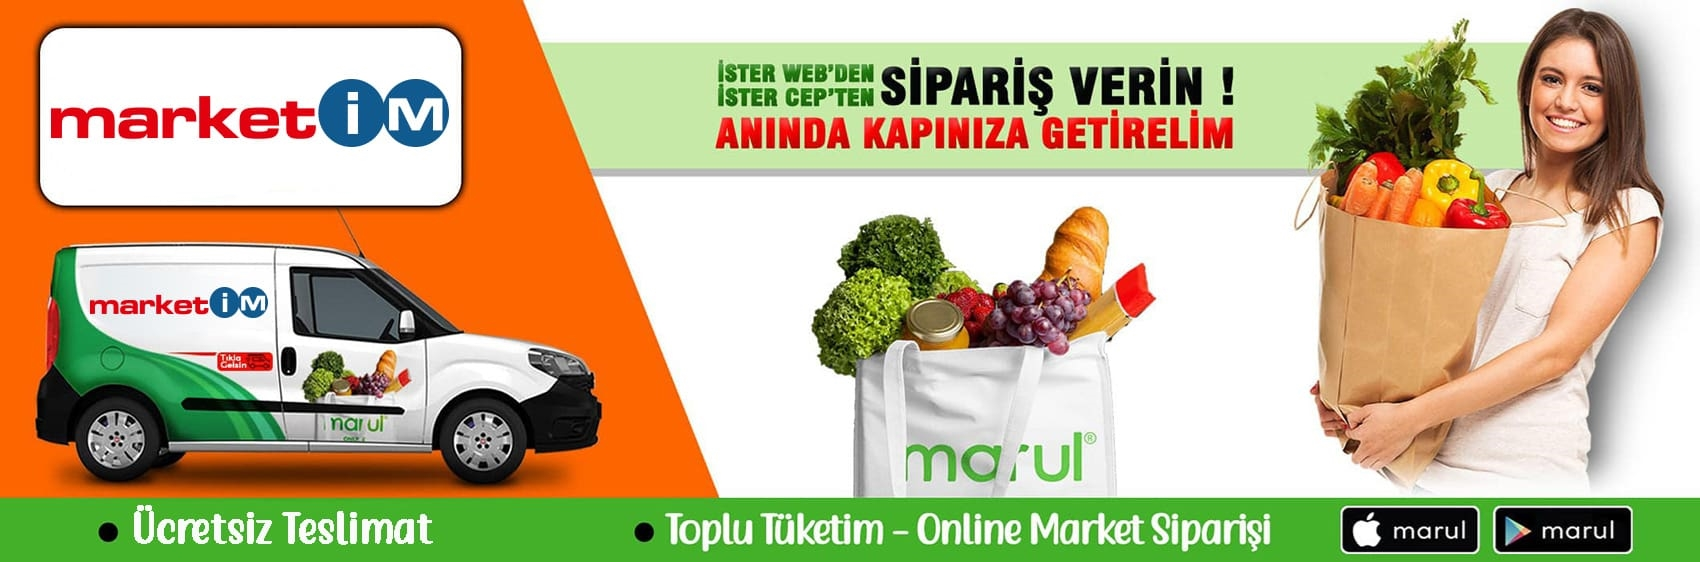 Artvin Marketim Gross Online Market Siparişi